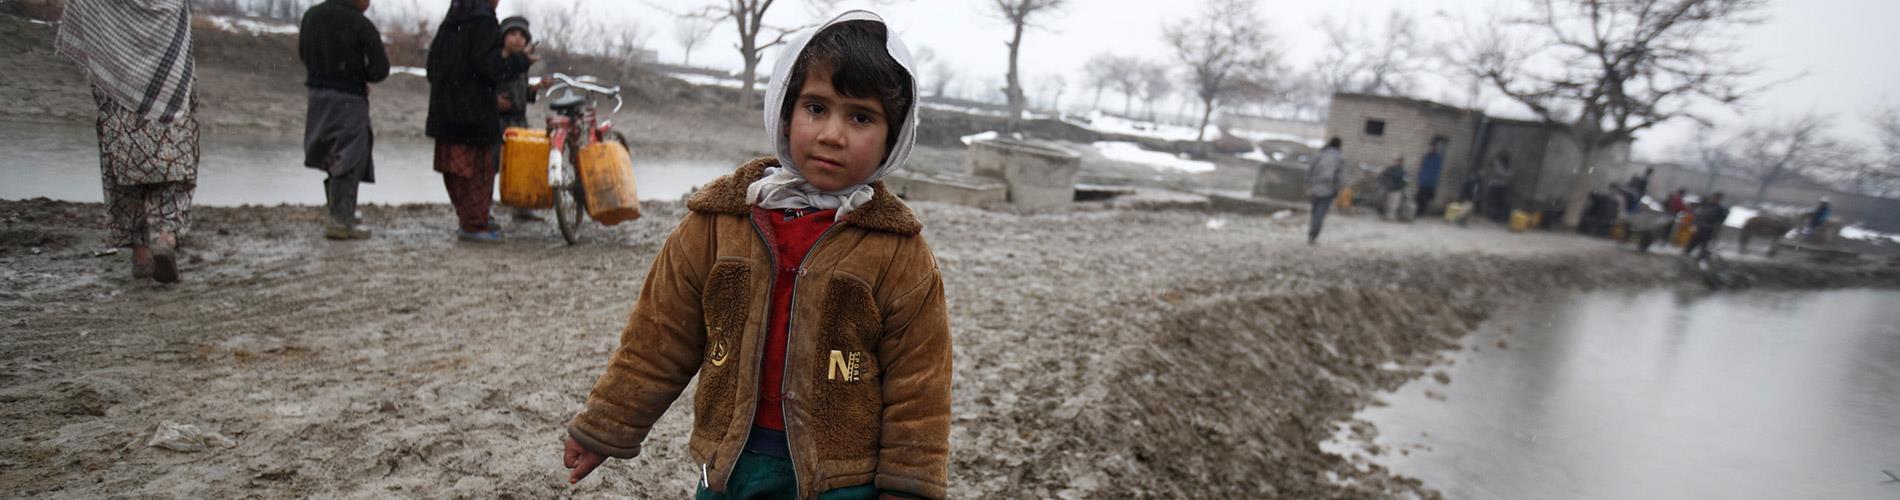 enfant boue bidon Afghanistan